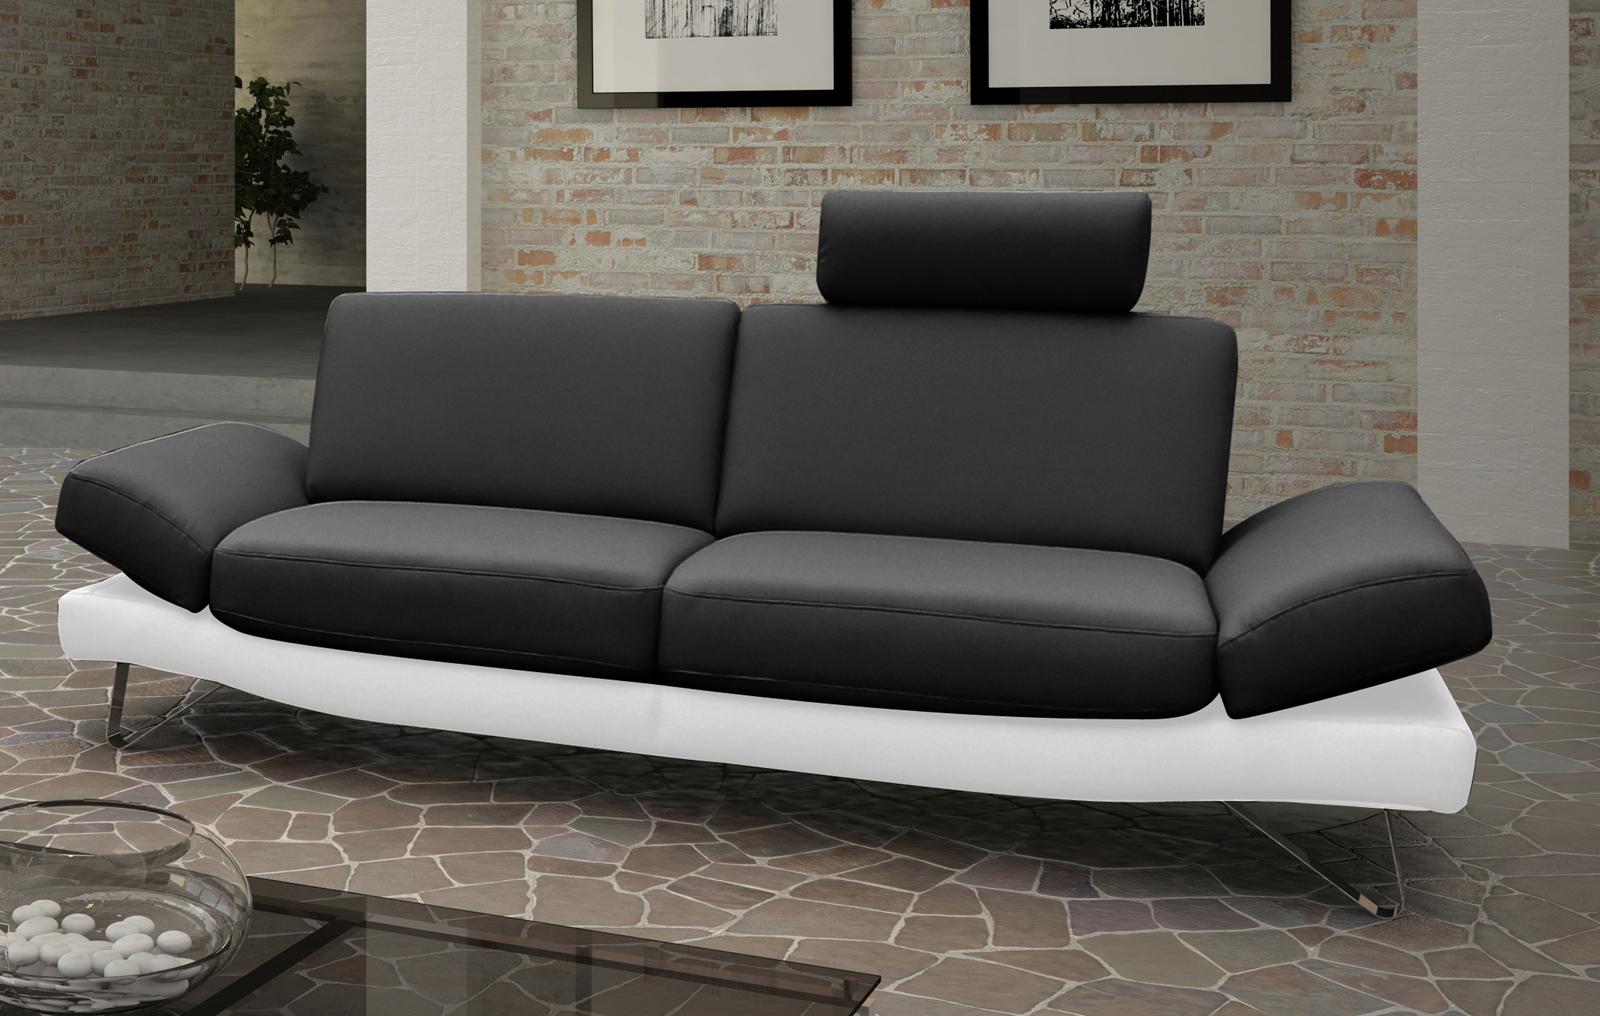 sam design sofa garnitur 2 3 sitzer schwarz wei classic. Black Bedroom Furniture Sets. Home Design Ideas